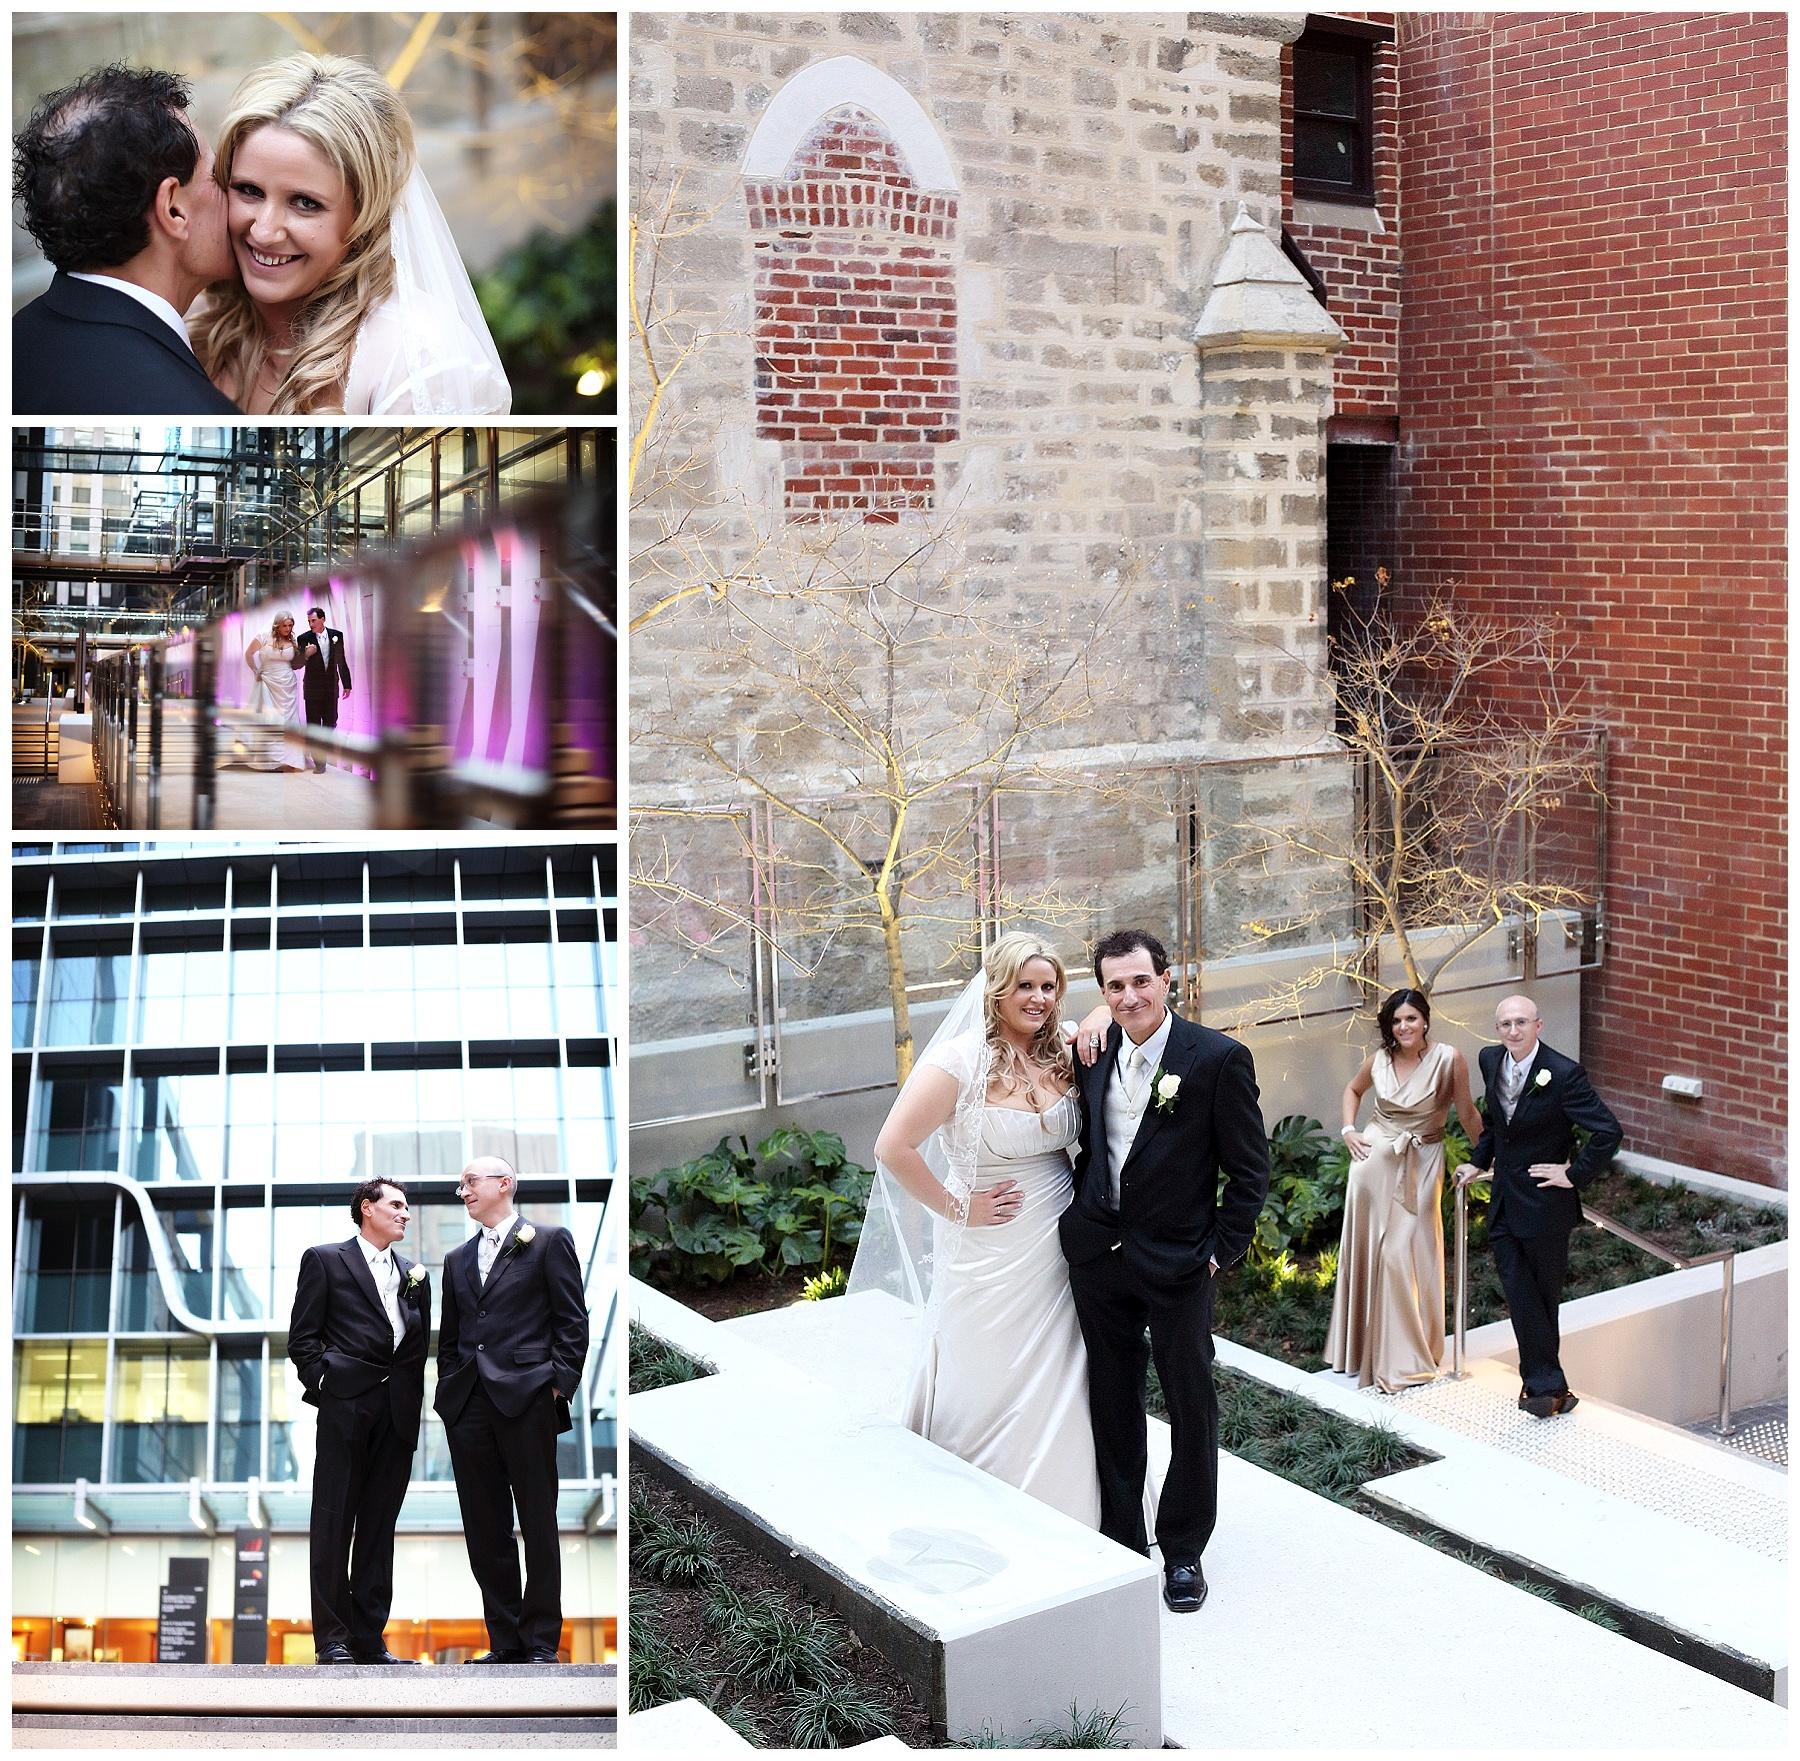 award winning wedding photographer perth